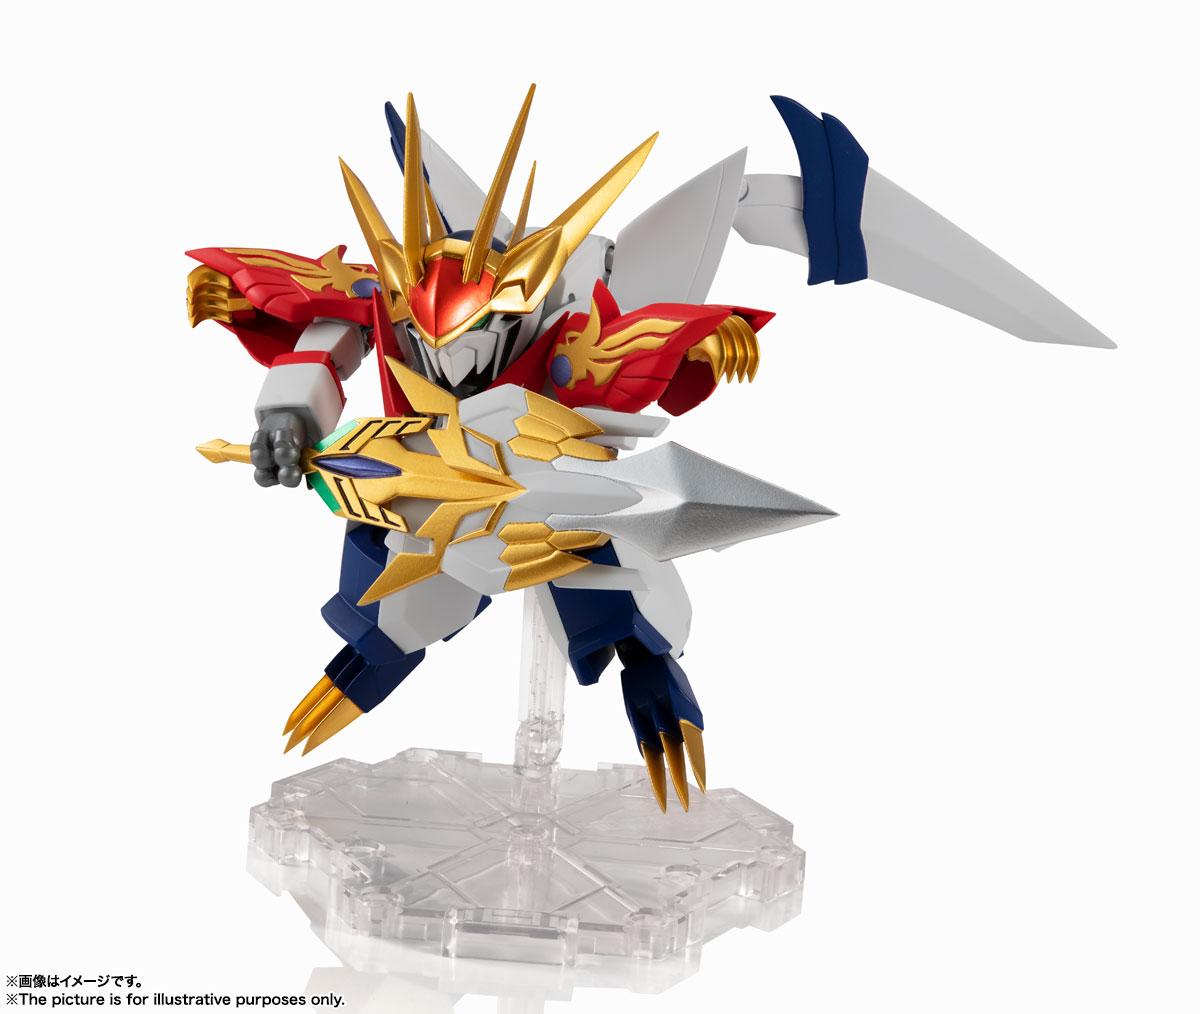 NXEDGE STYLE[MASHIN UNIT]『龍虎丸』魔神英雄伝ワタル 可動フィギュア-004